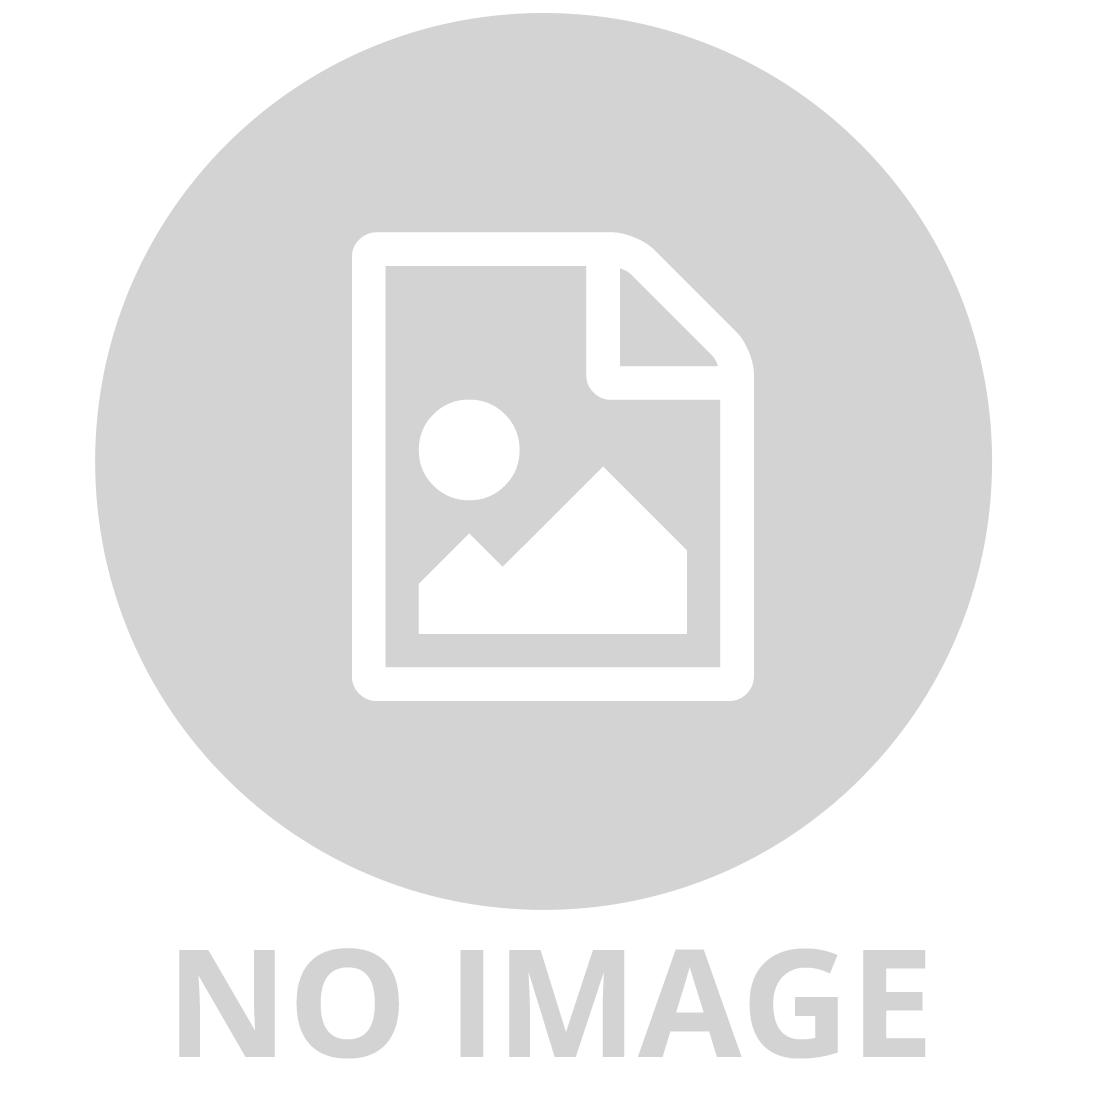 LEGO 76089 MARVEL MIGHTY MICRO SCARLET SPIDER VS SANDMAN